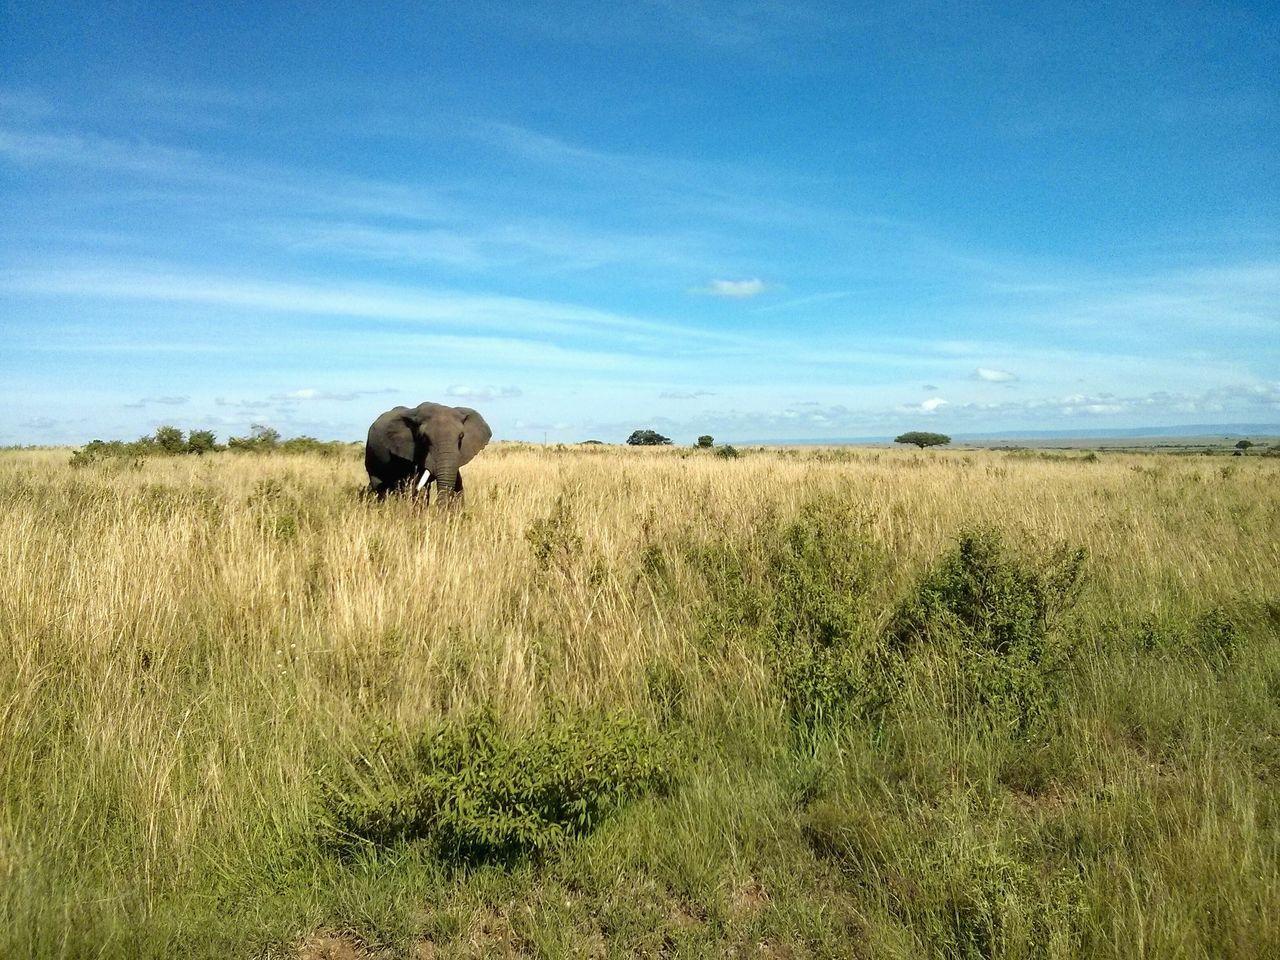 The Elephant. · Masai Mara Kenya Africa Safari Nature Landscape Animals Beautiful Nature Nature On Your Doorstep